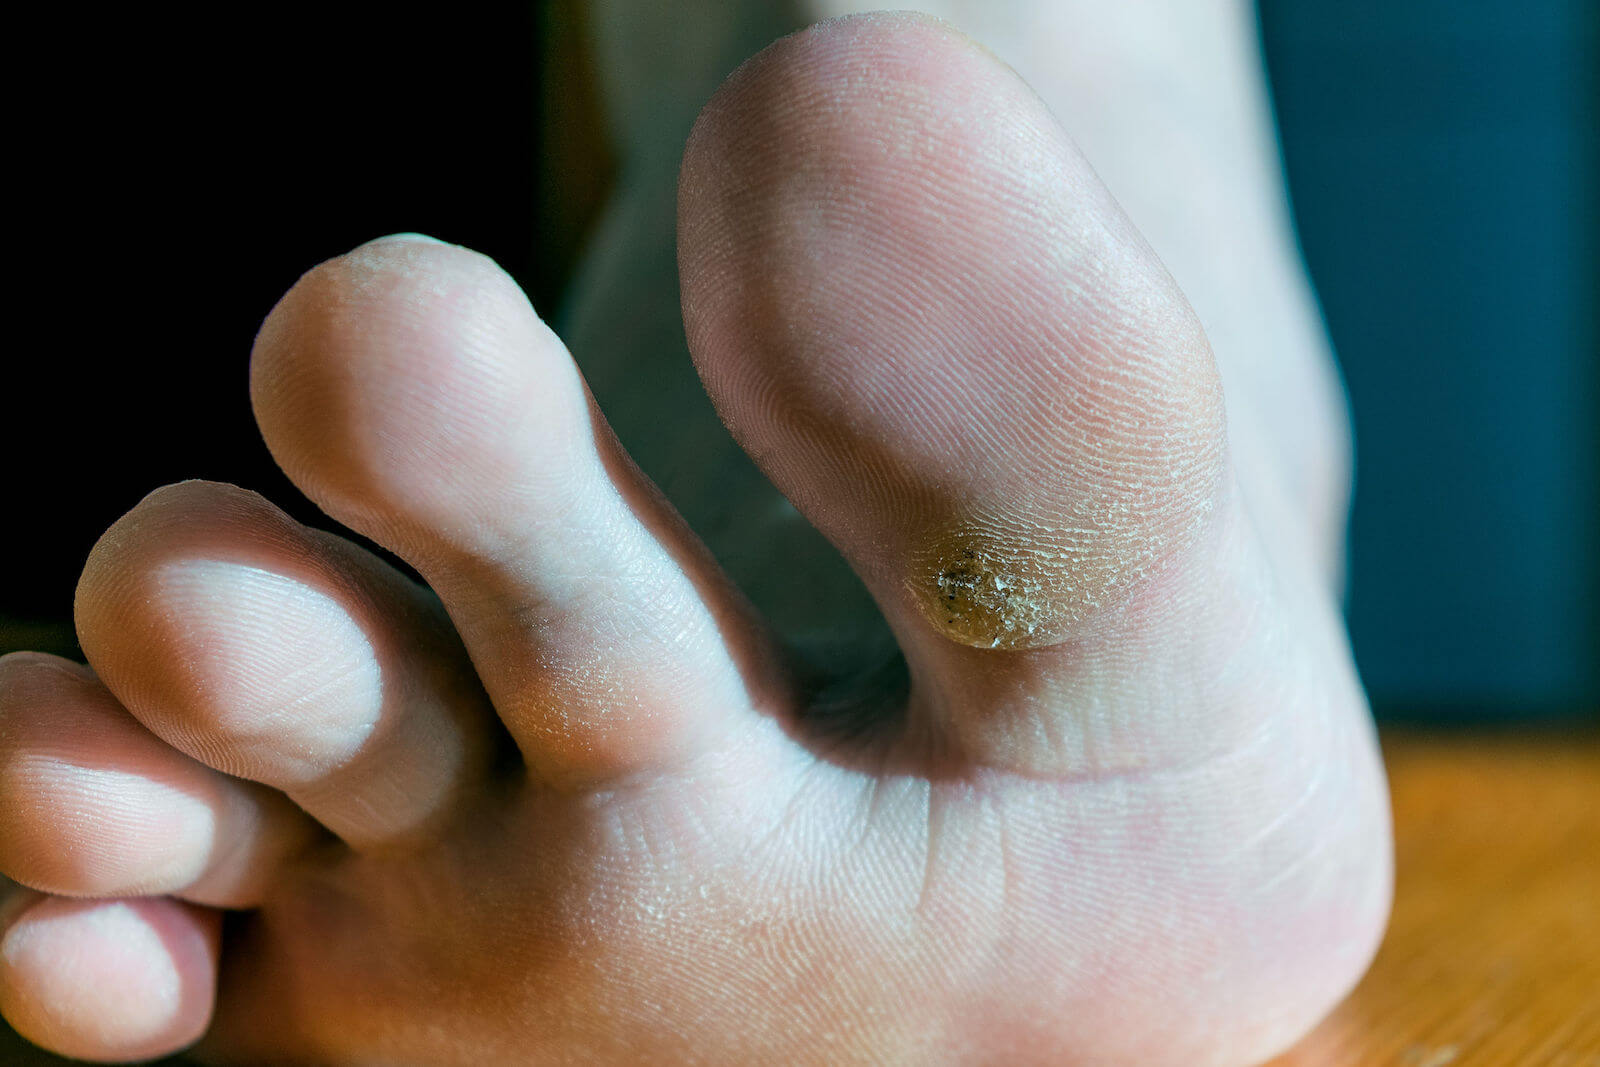 Dornwarzen am Fuß entfernen | Feet care, Skin care tips, Warts, Hpv feigwarzen entfernen